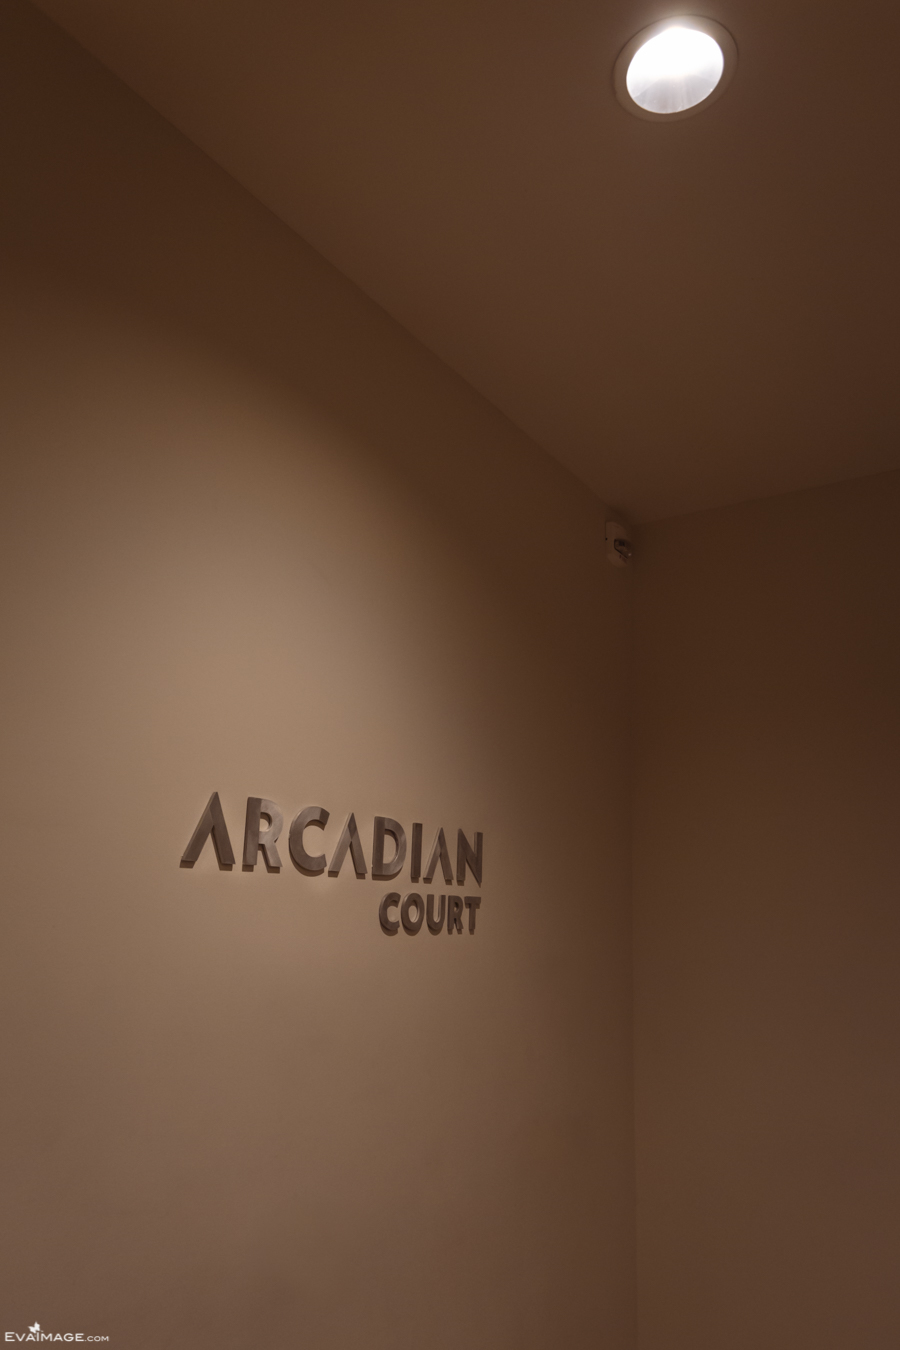 Arcadian Court Ryerson University Commerce Grad Gala 2016